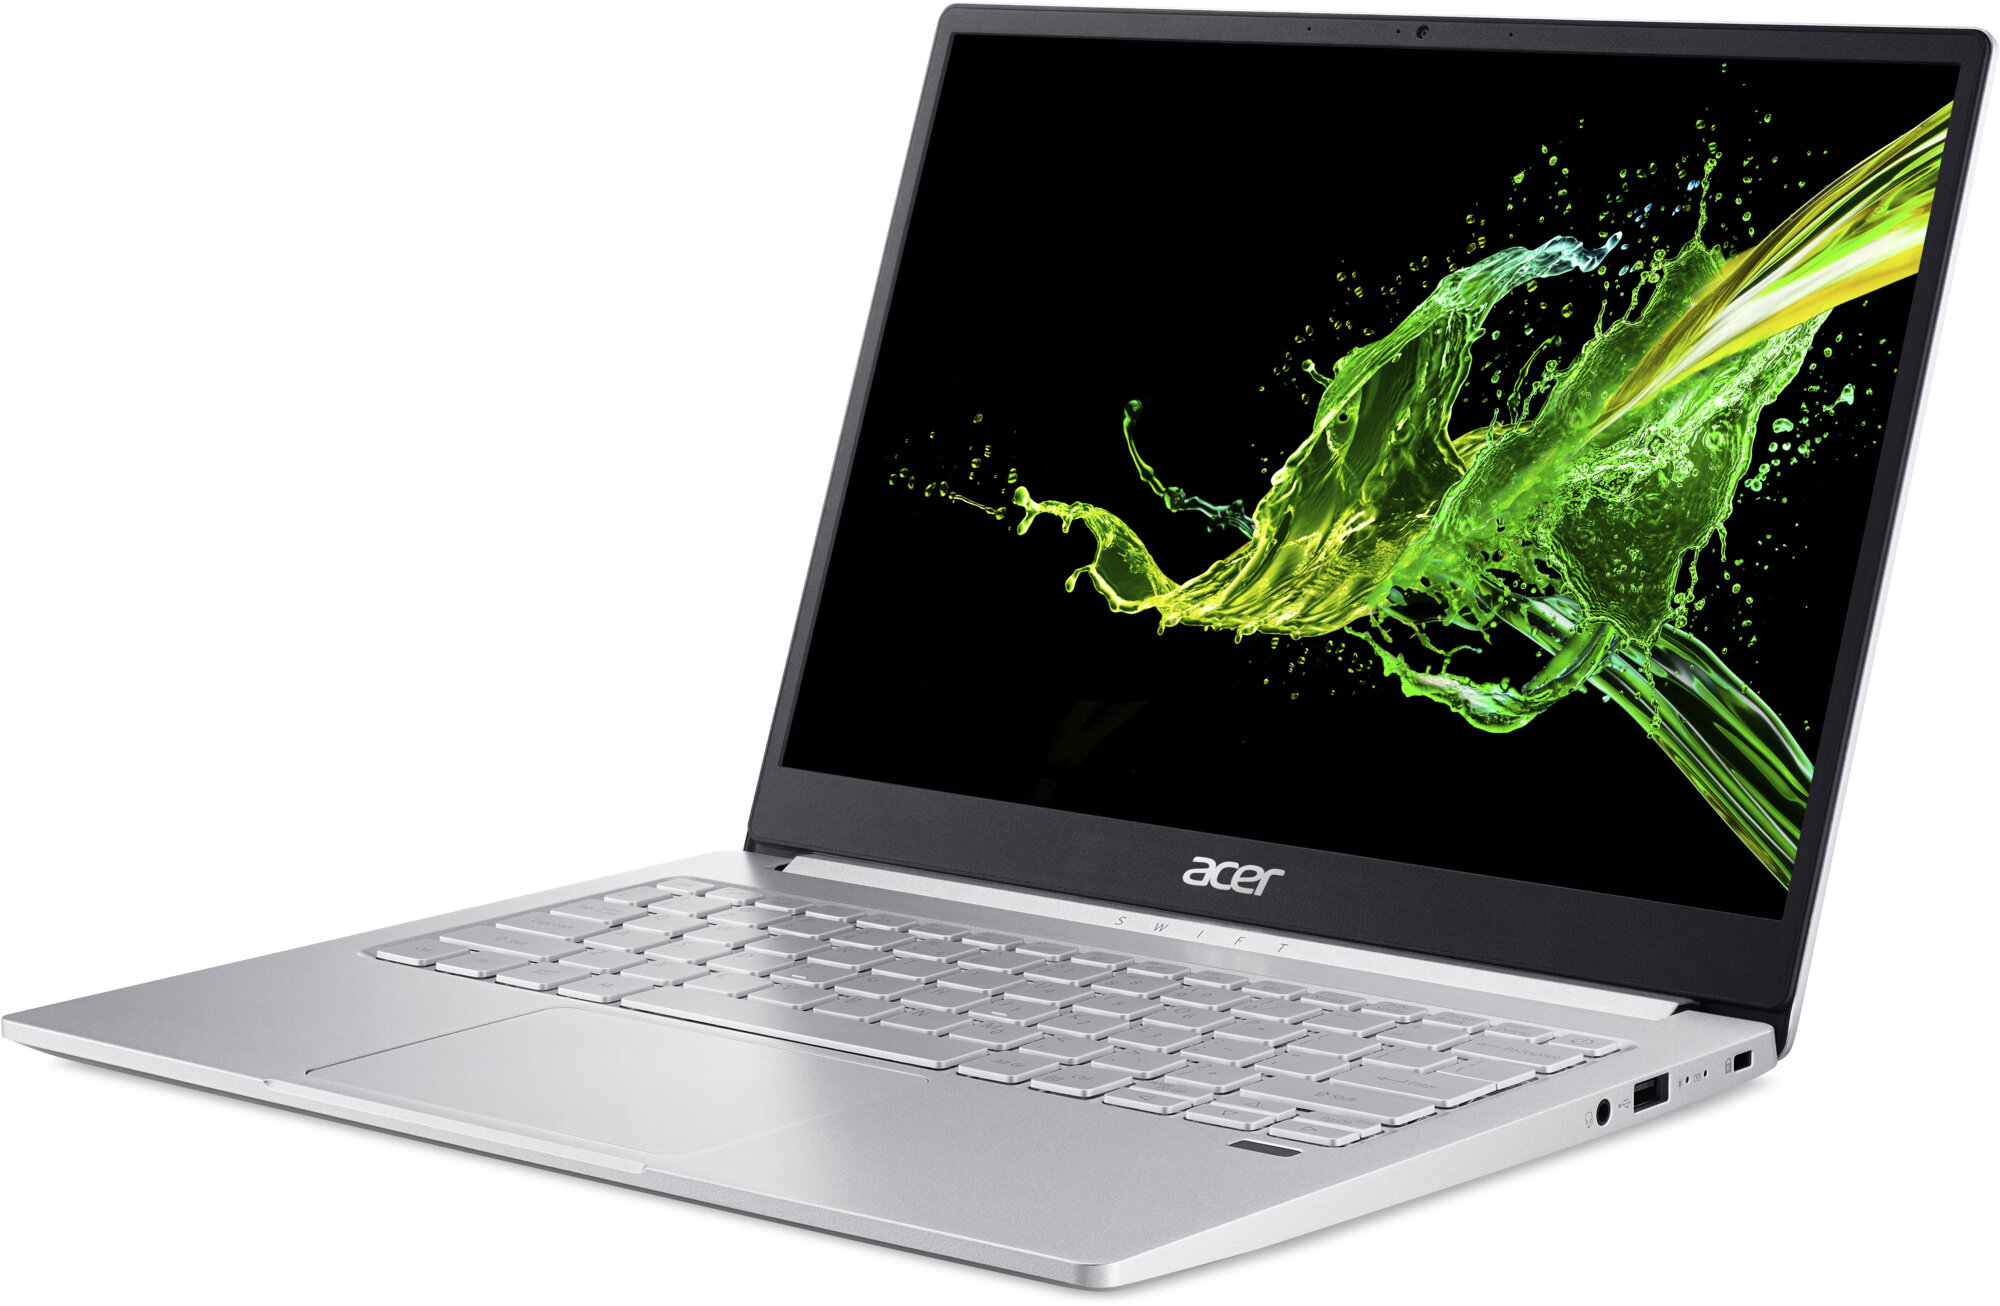 Acer Swift 3 SF313-52G-759U